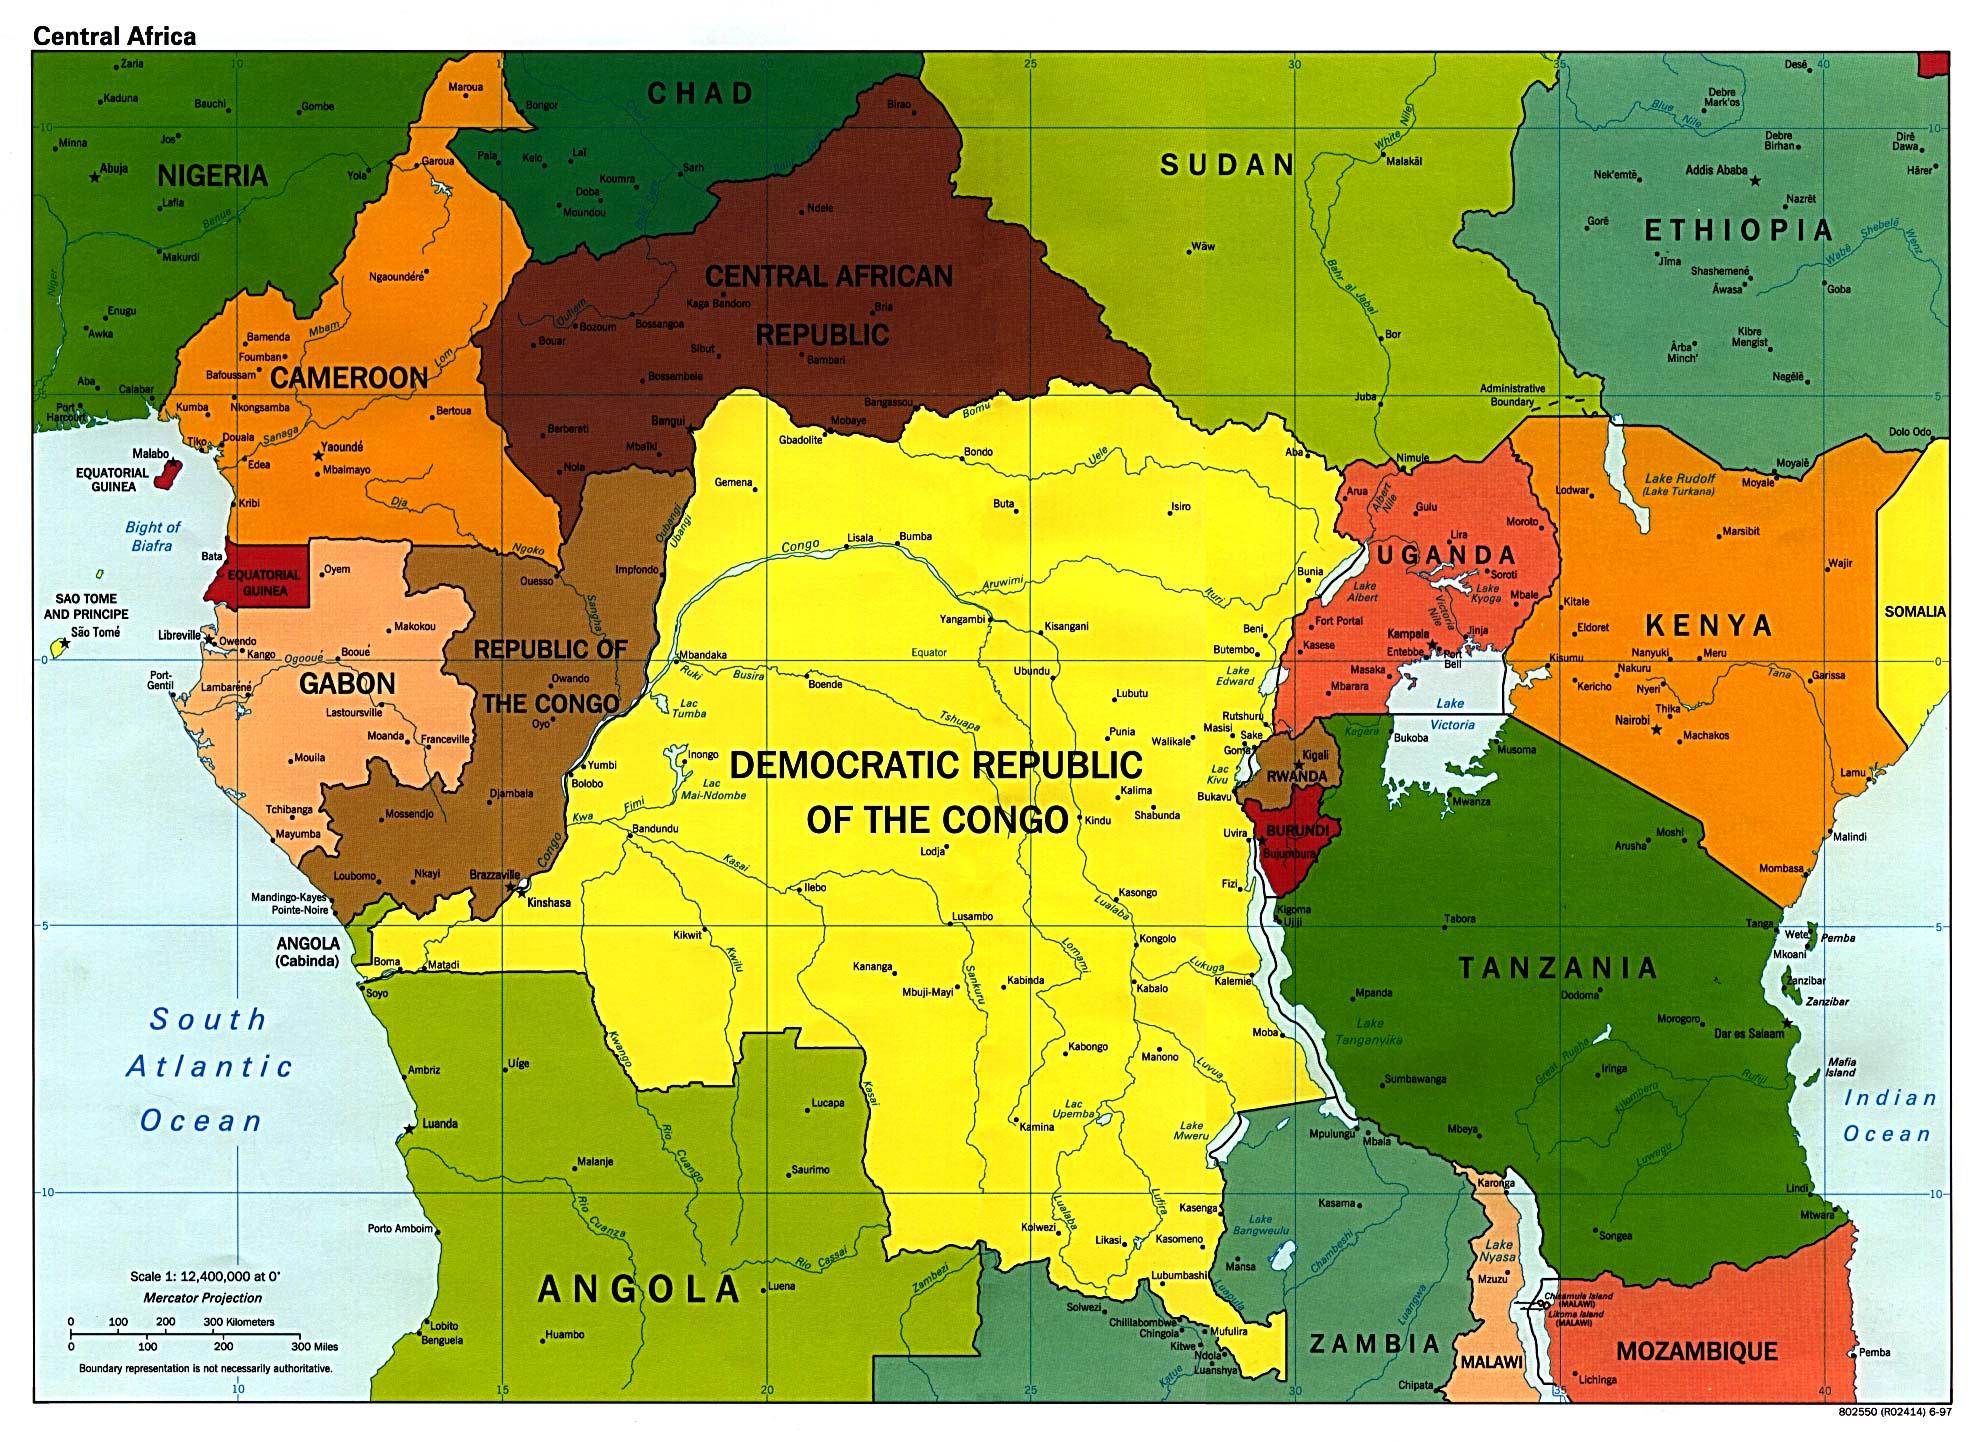 Mapa Politico de África Central 1997